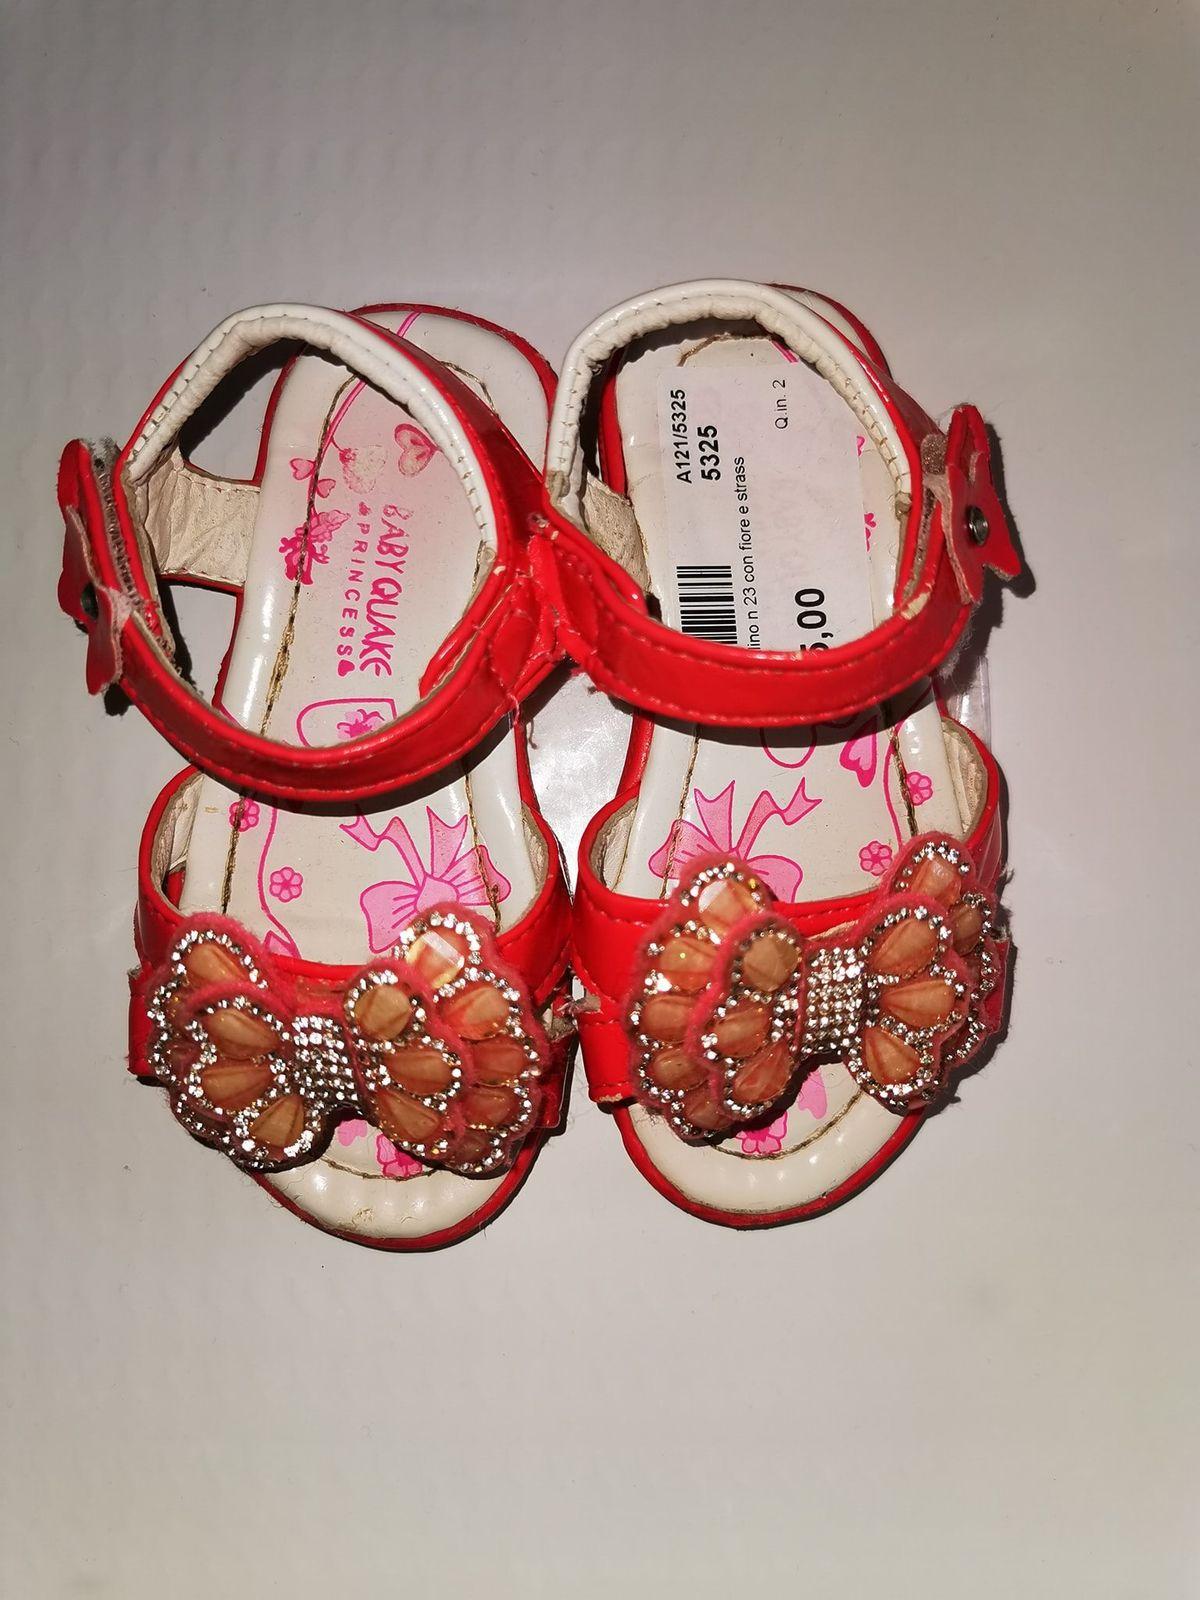 Sandalo n.23 codice 5325 Euro 5,00